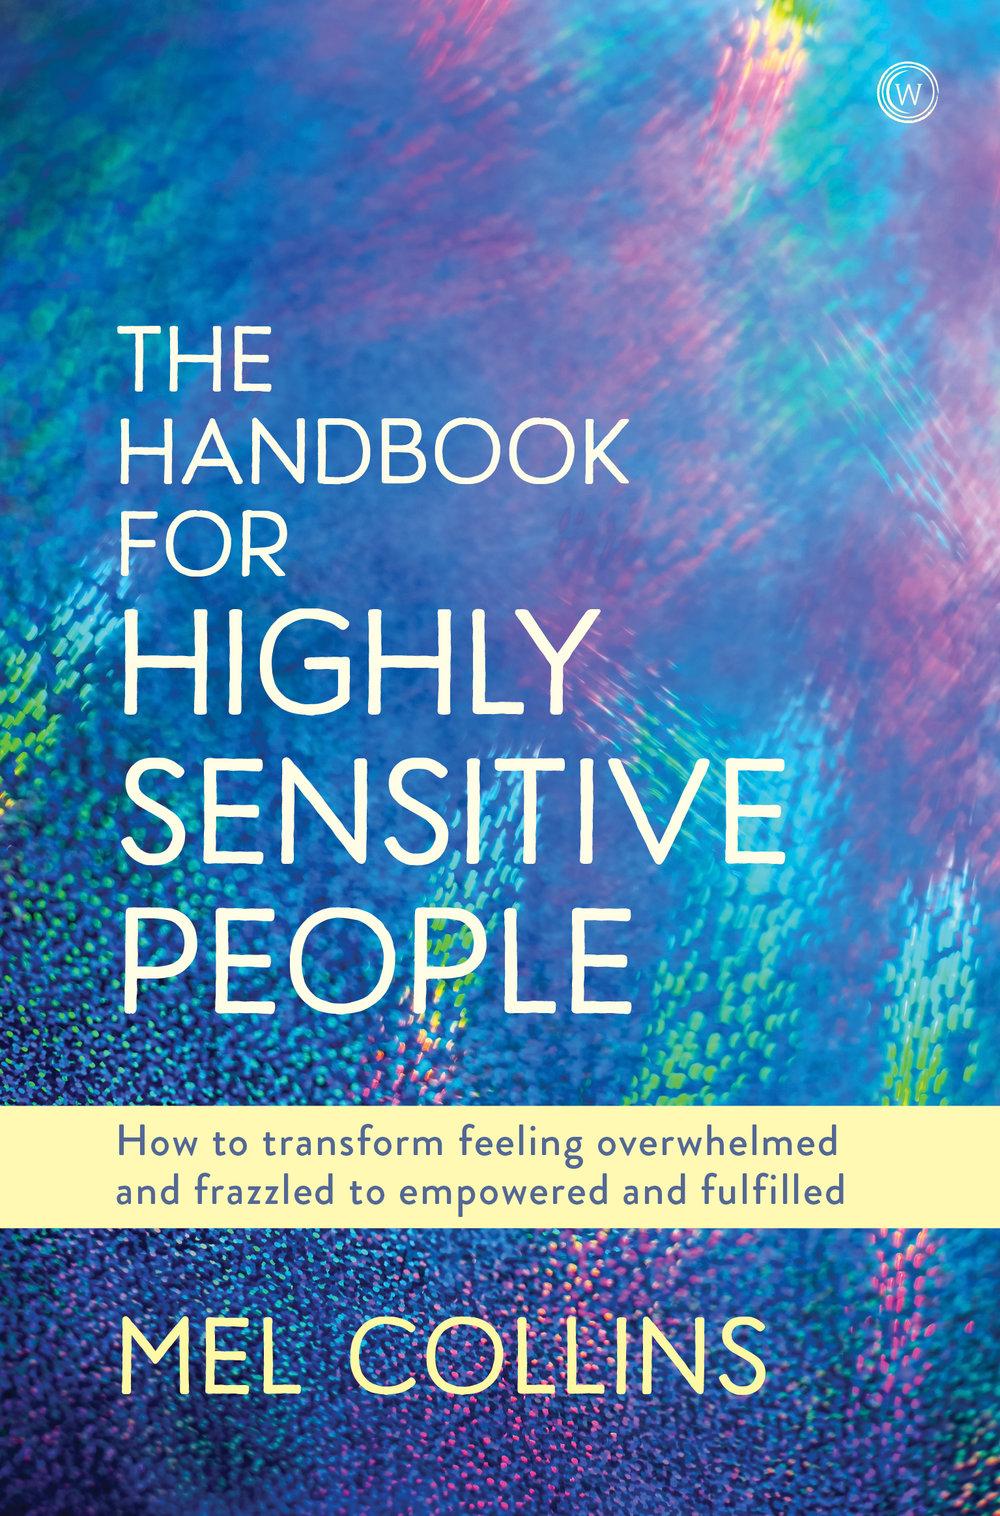 TheHanbookForHighlySensitivePeople_Minijacket.jpg